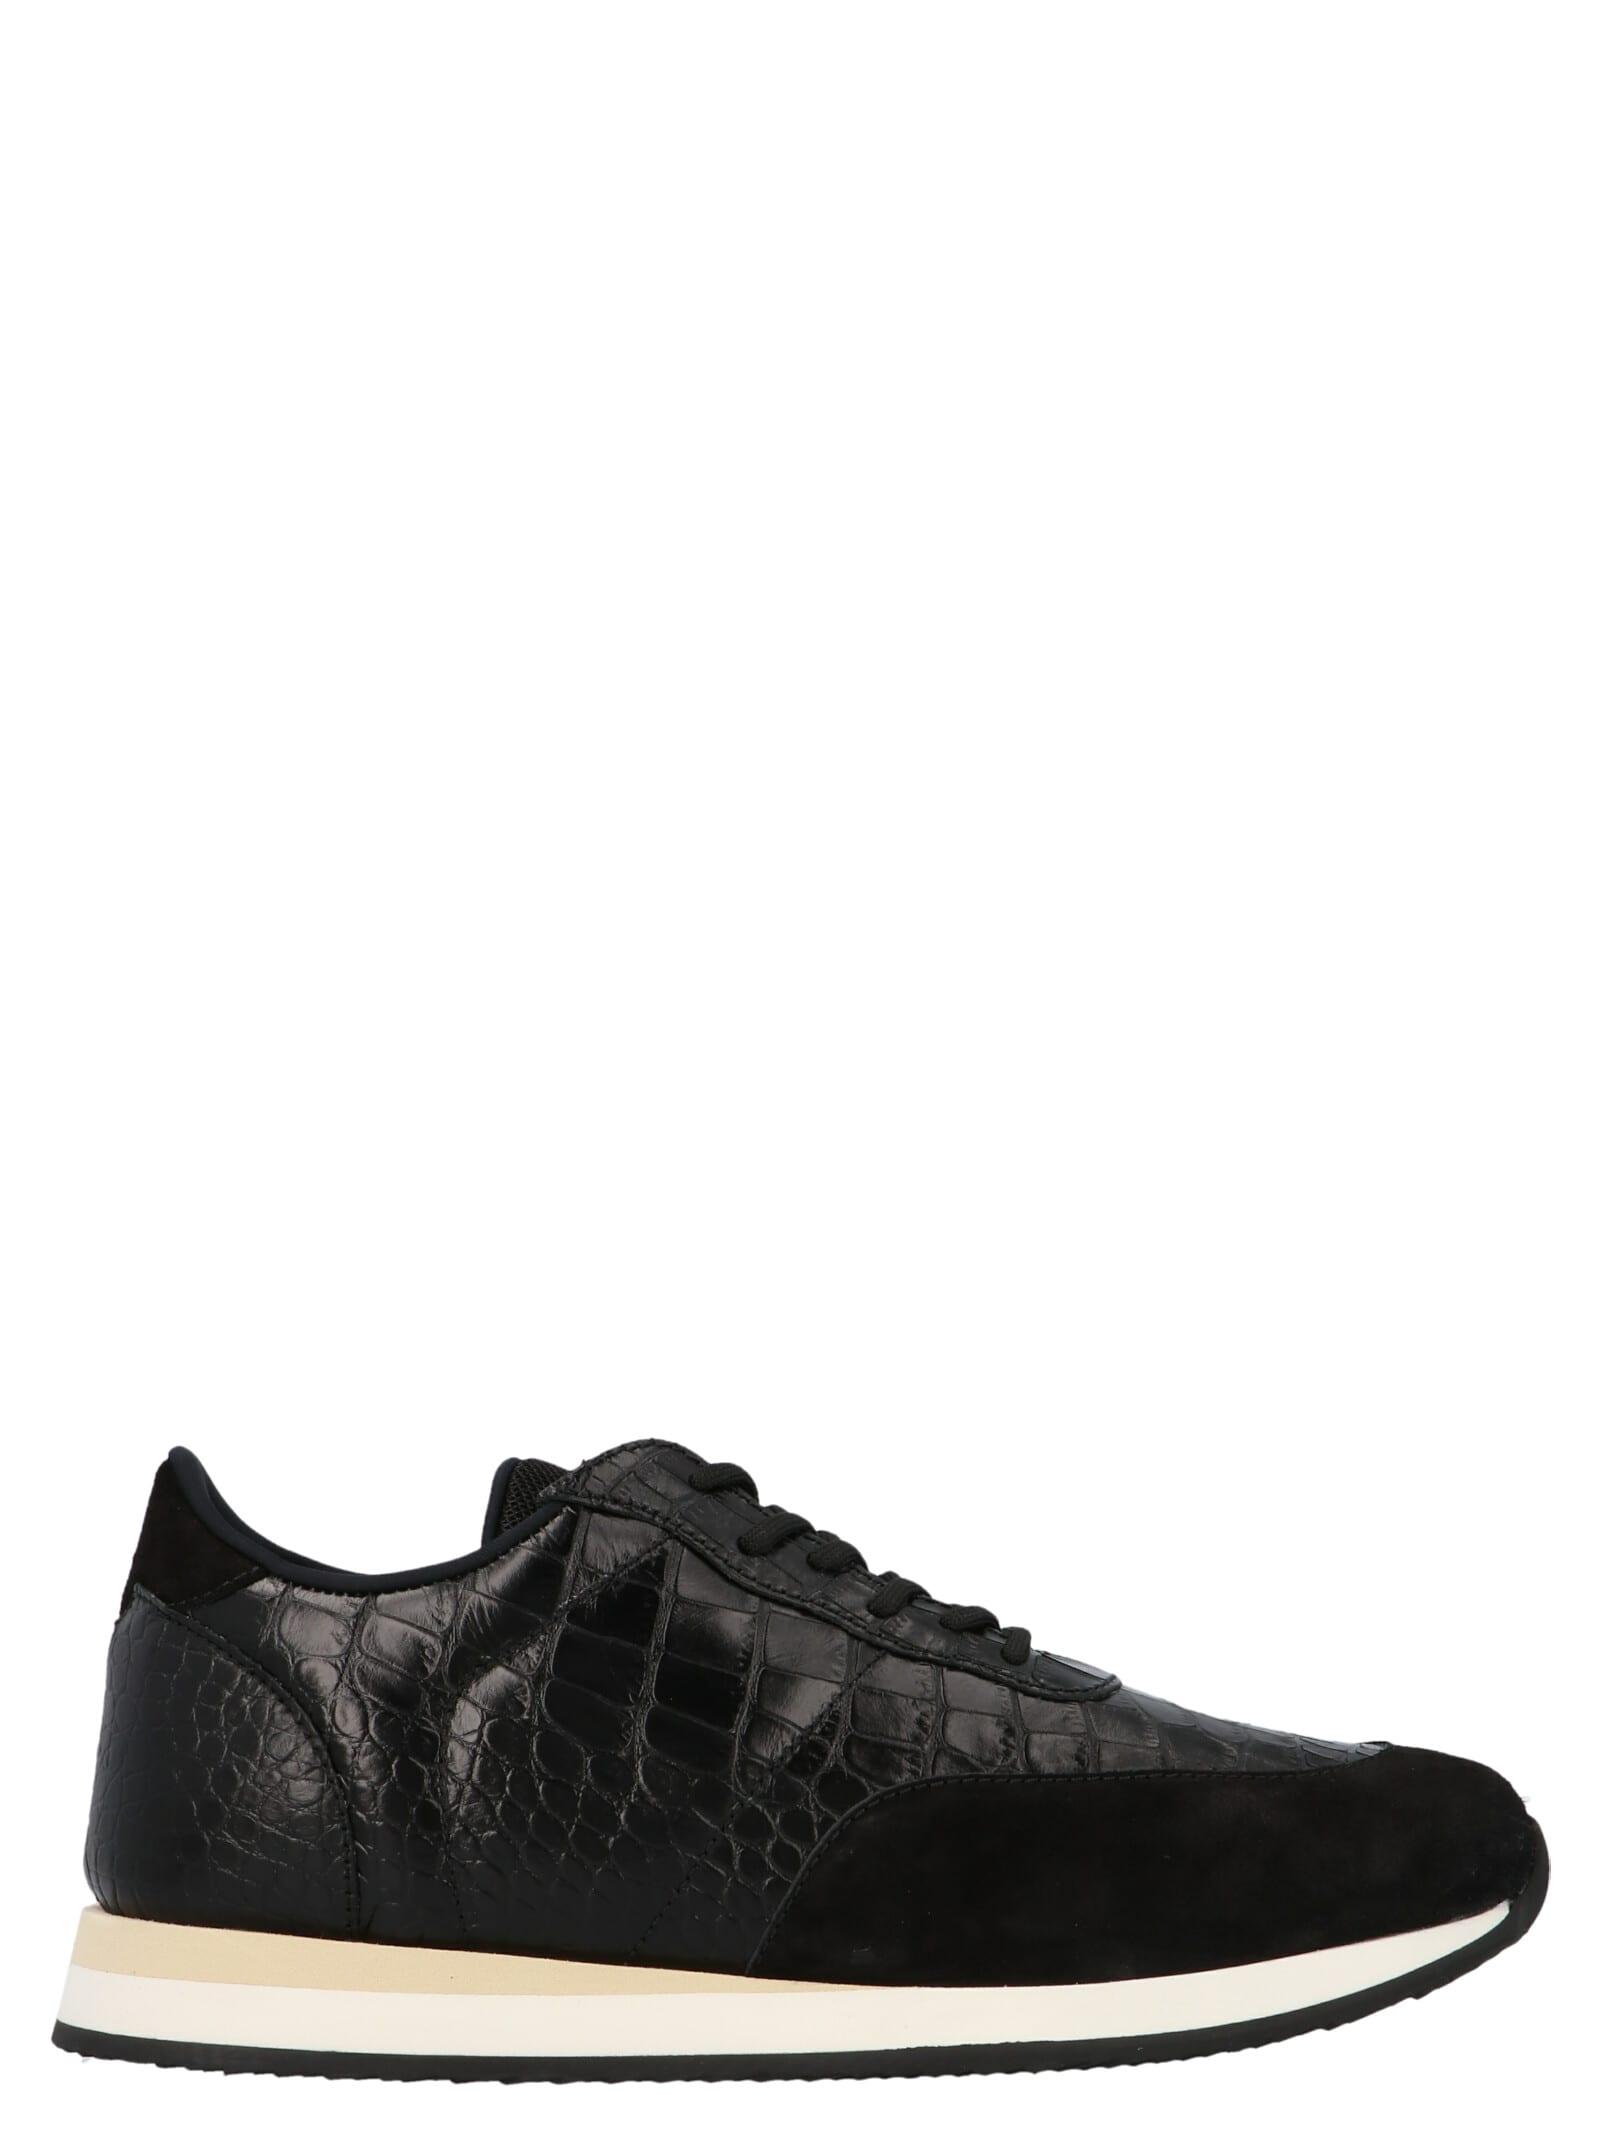 Giuseppe Zanotti Jimy Shoes